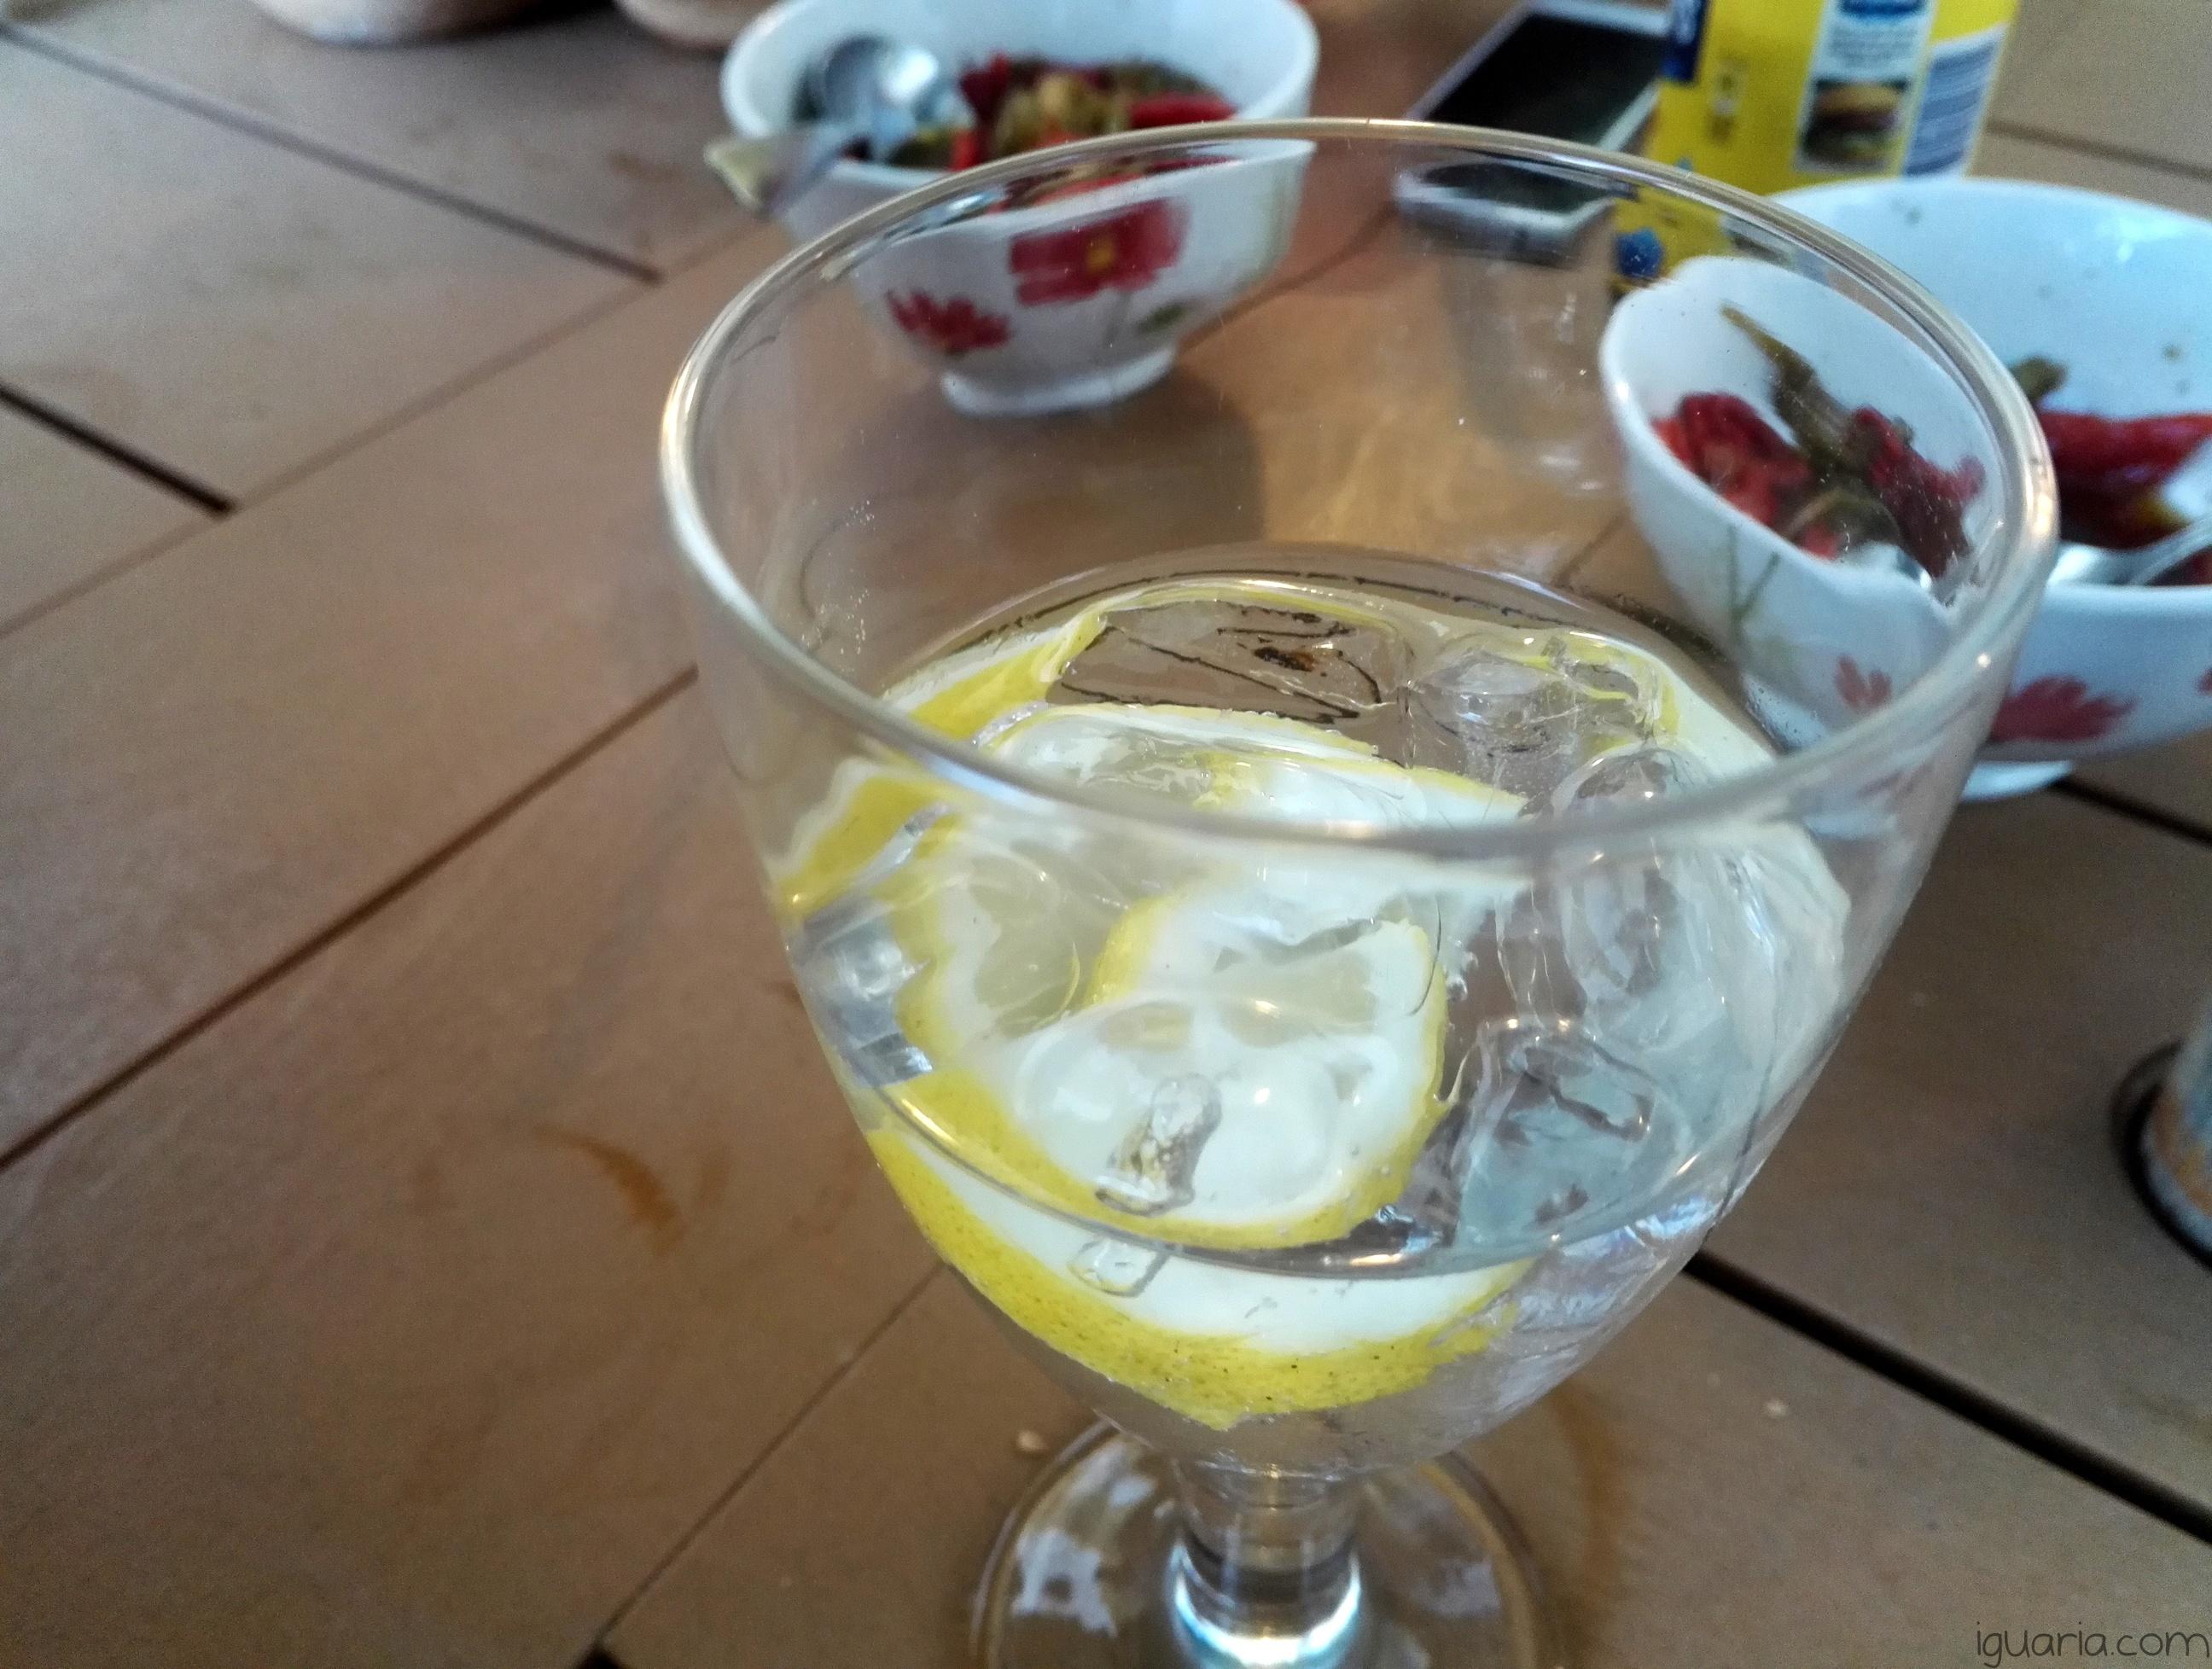 Iguaria_Gin-Tonico-Limao